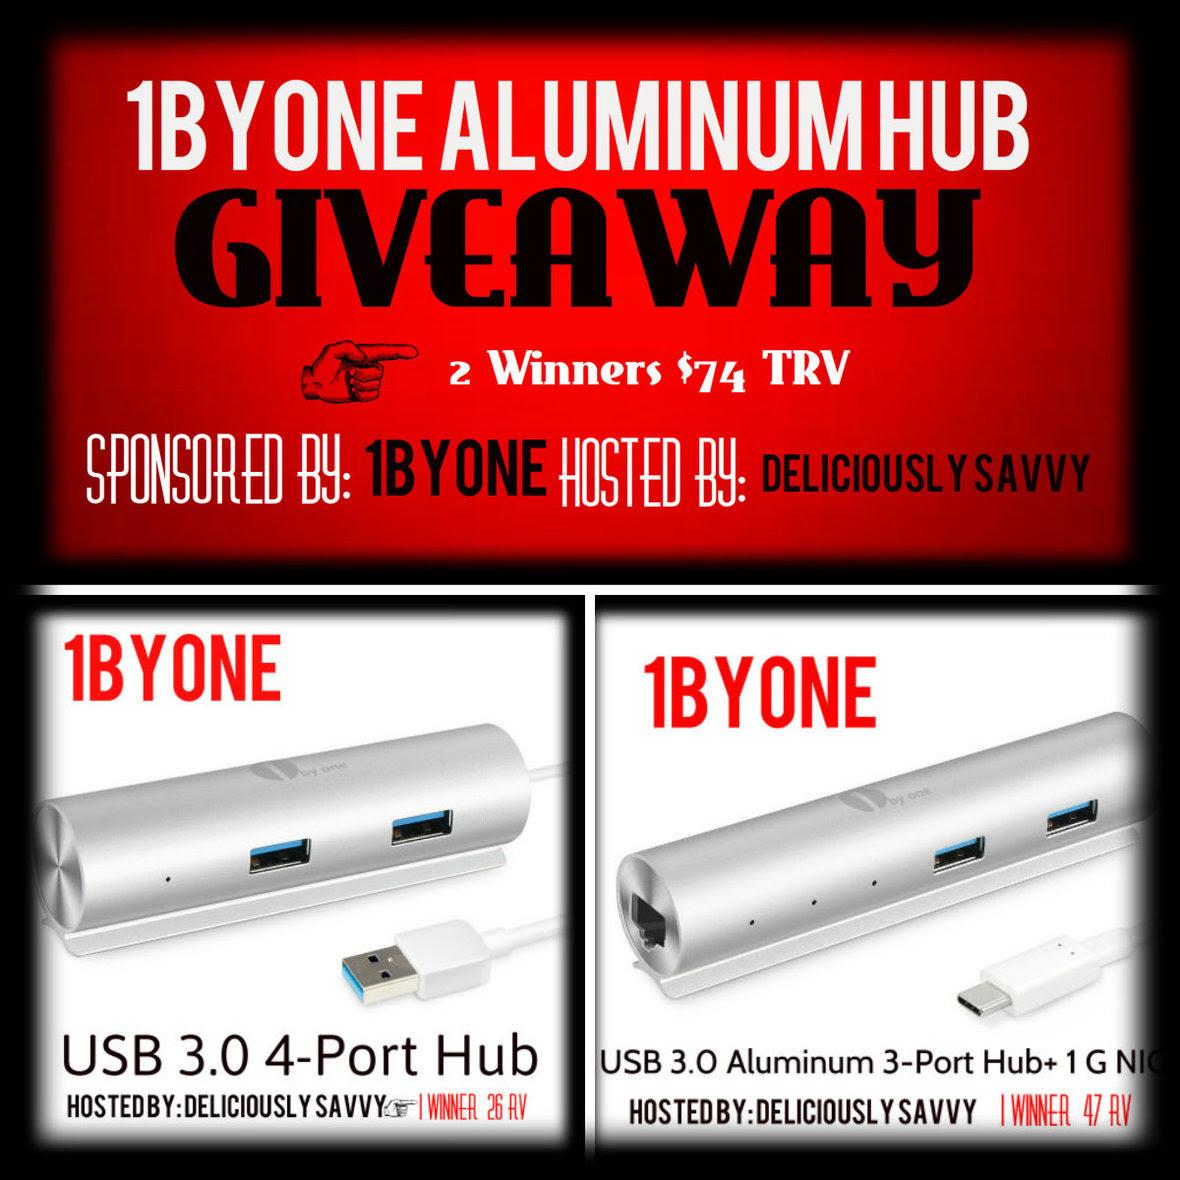 #1ByOne Aluminum Hub #Giveaway Ends 4/29